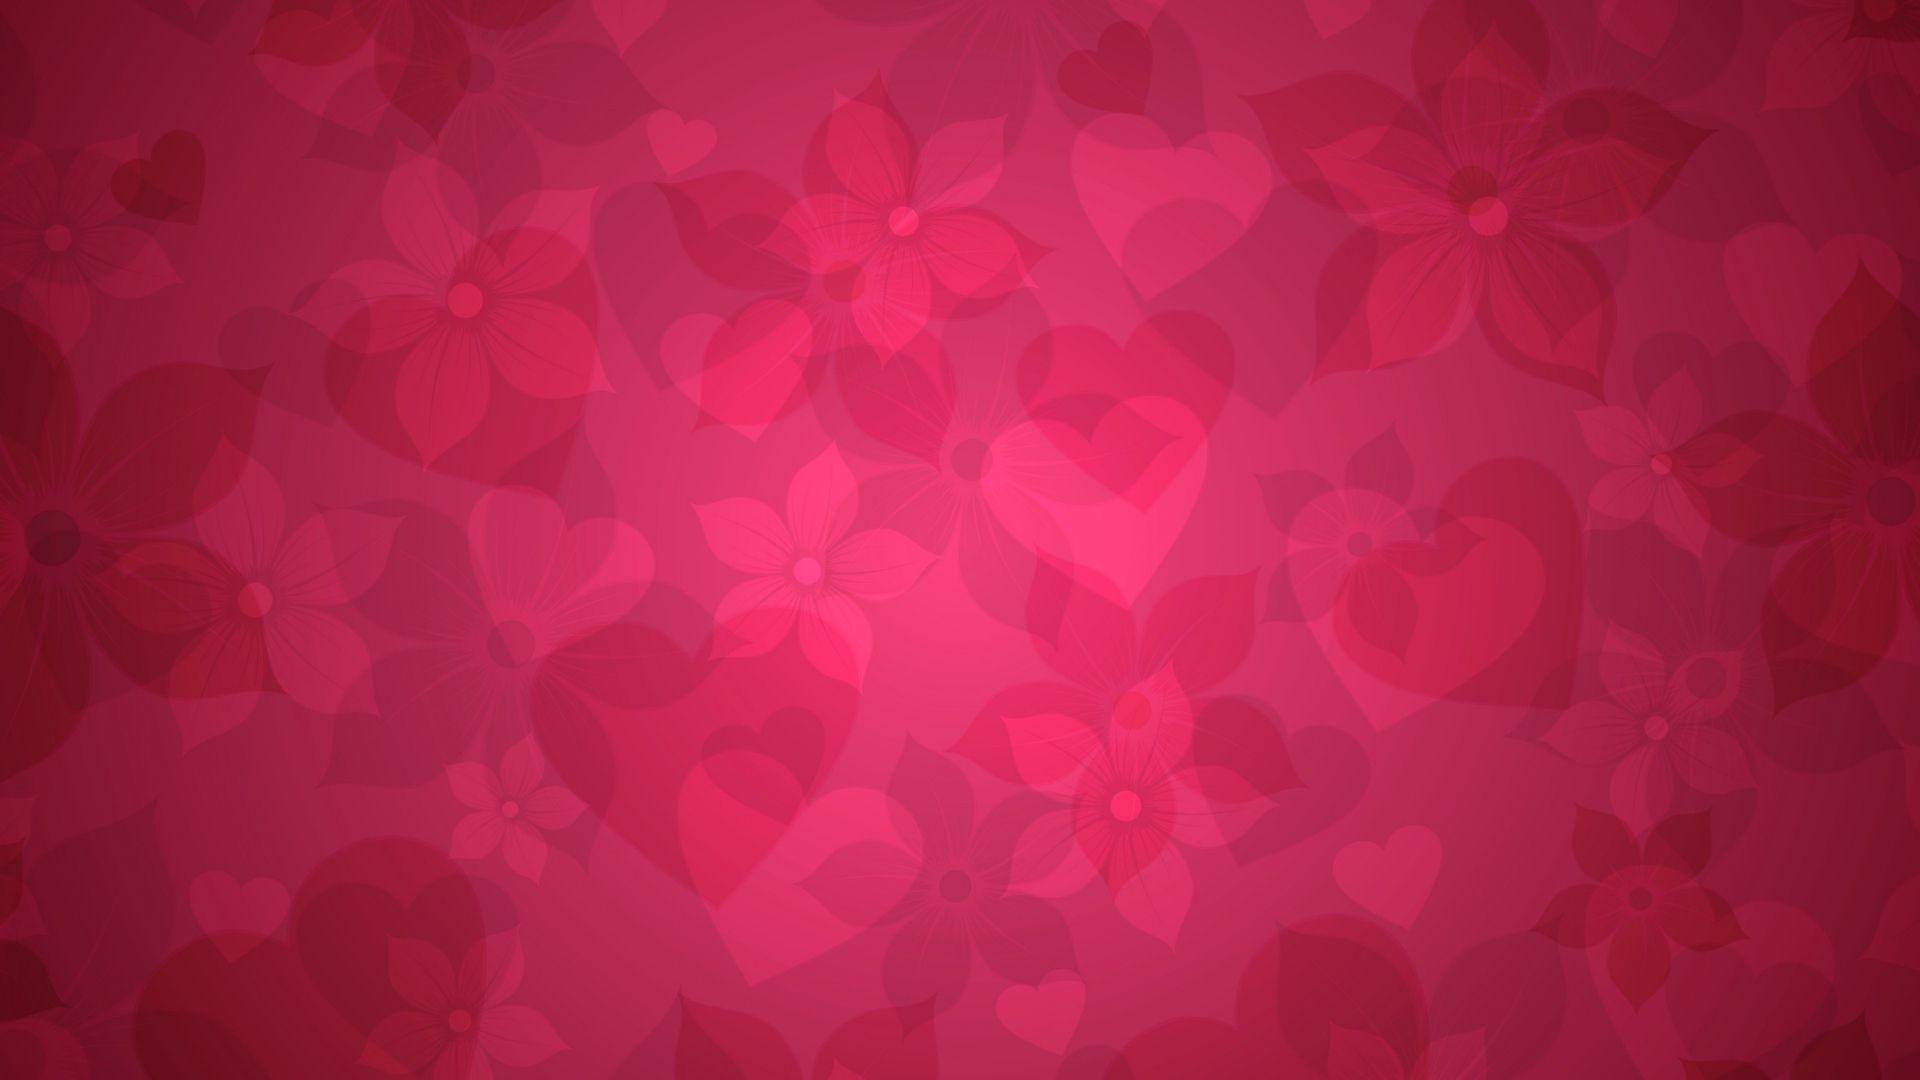 Pink Heart Background Wallpaper X